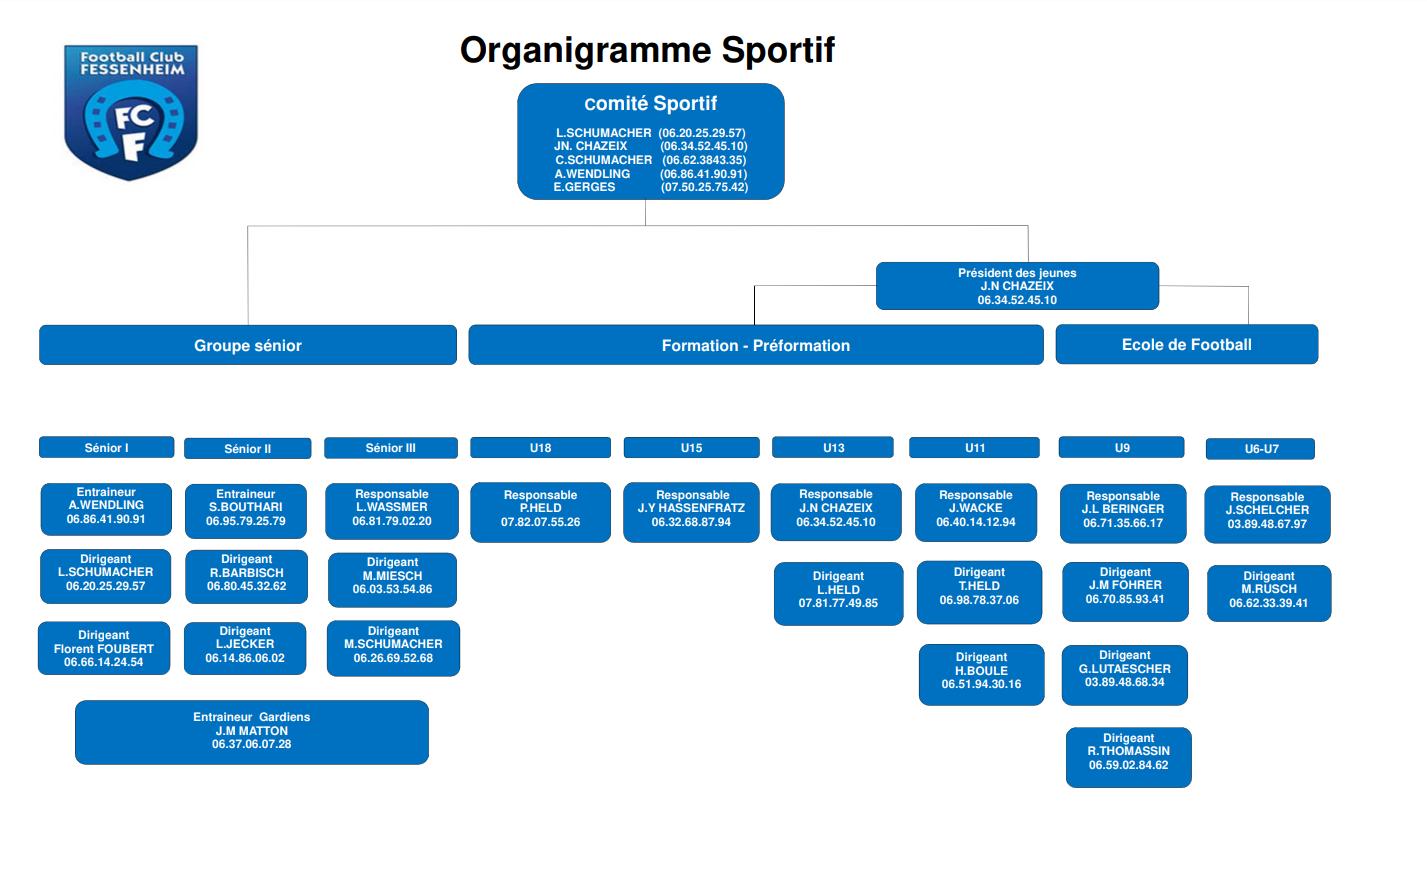 organigramme sportif.png